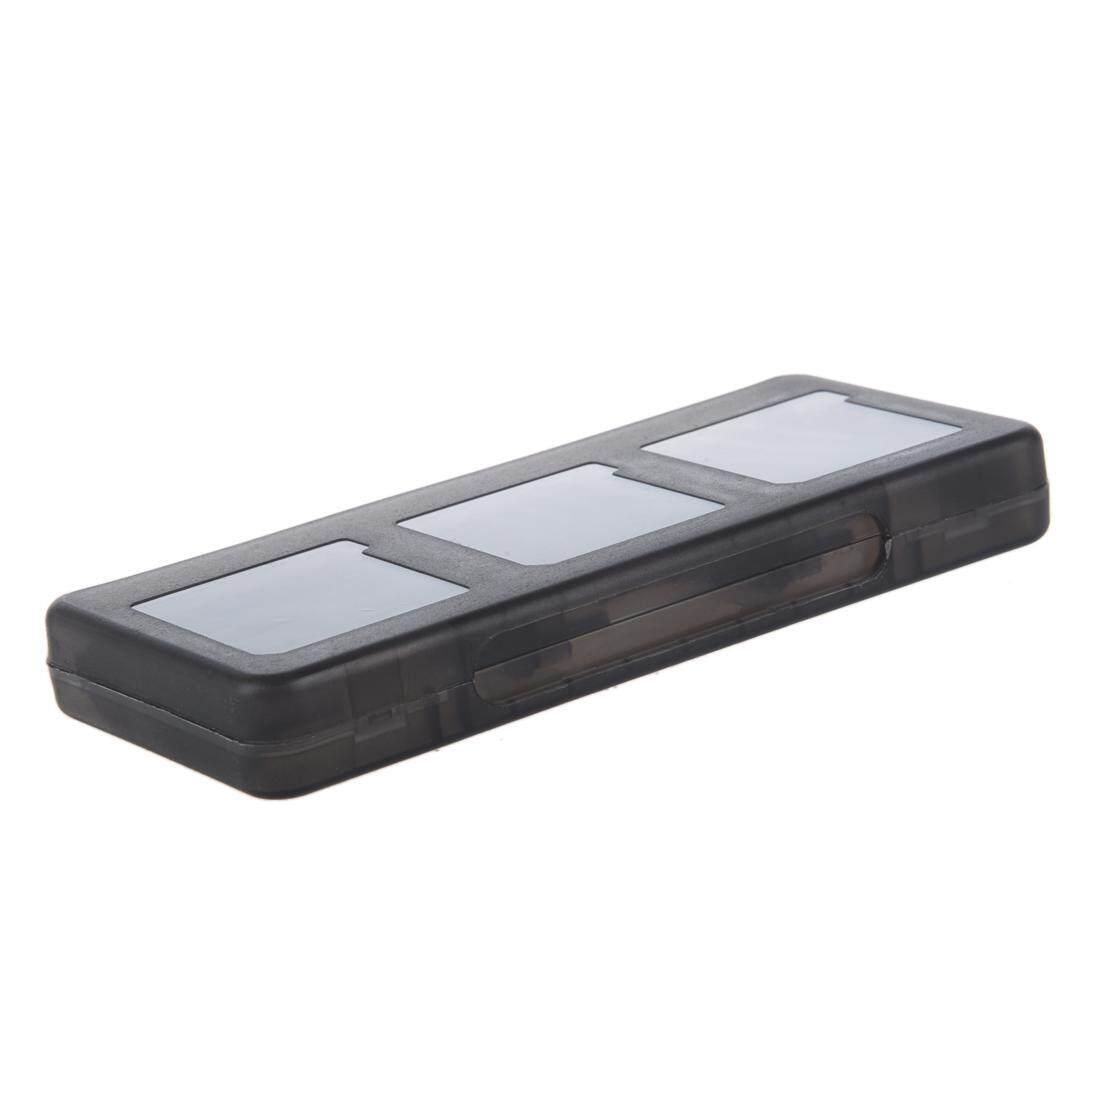 Cek Harga Nintendo Ds Lite Charger Power Adaptor Terbaru Nds Black 6 In 1 Game Case Holder Cartridge Box For Dsi Xl Ll